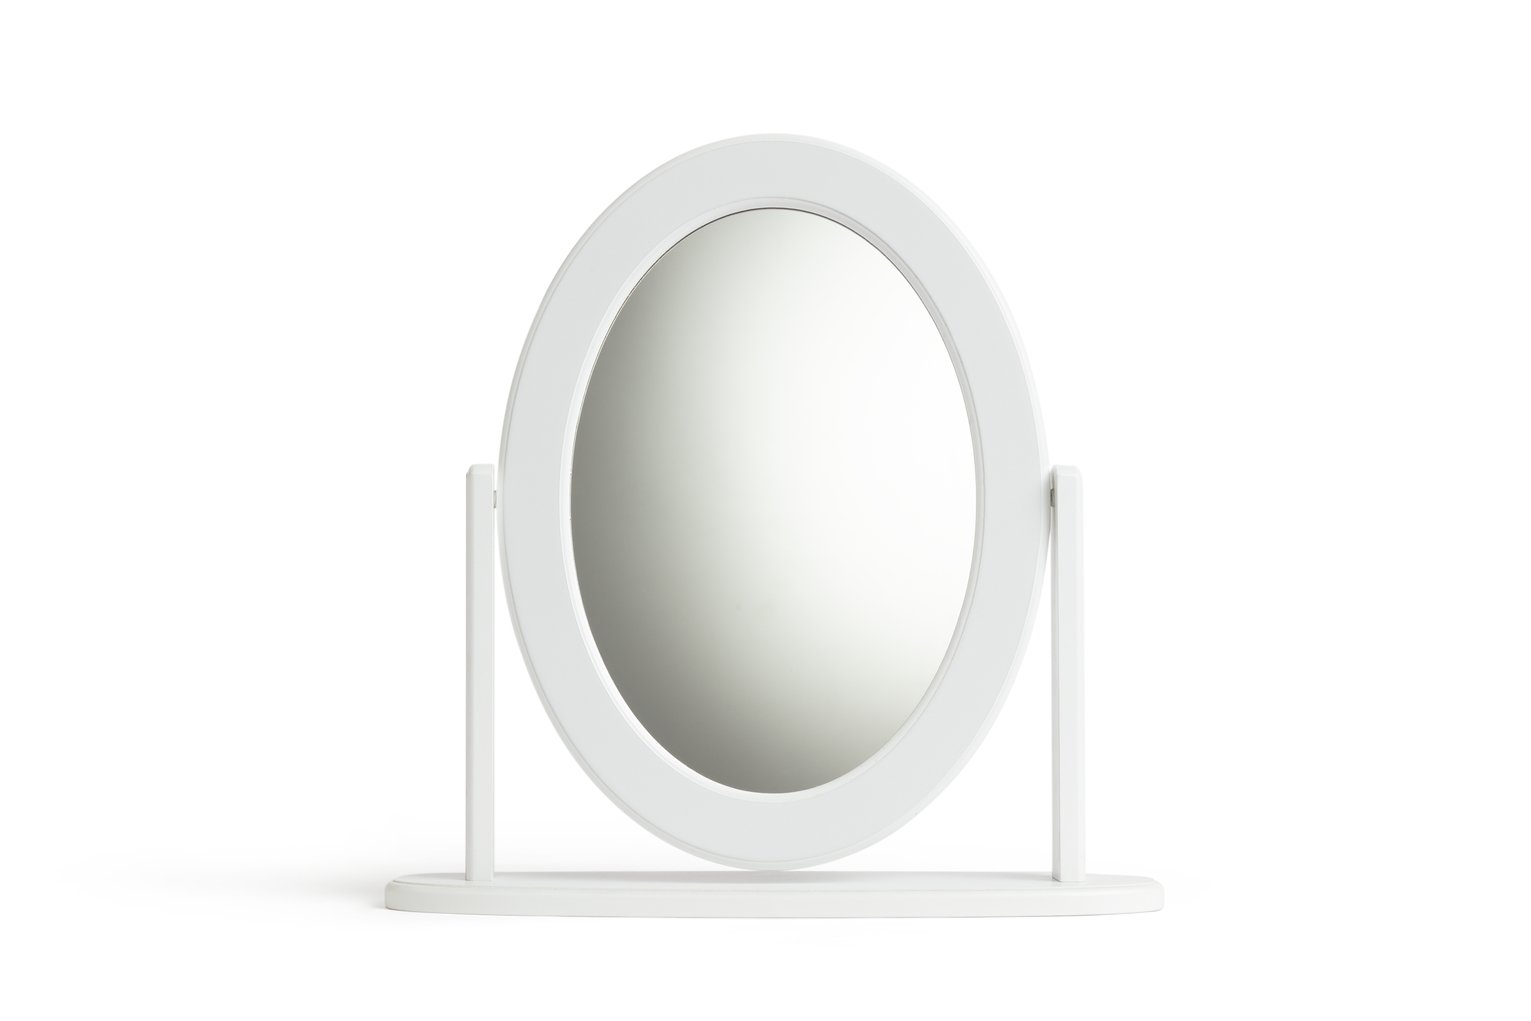 Argos Home Oval Dressing Table Mirror - White